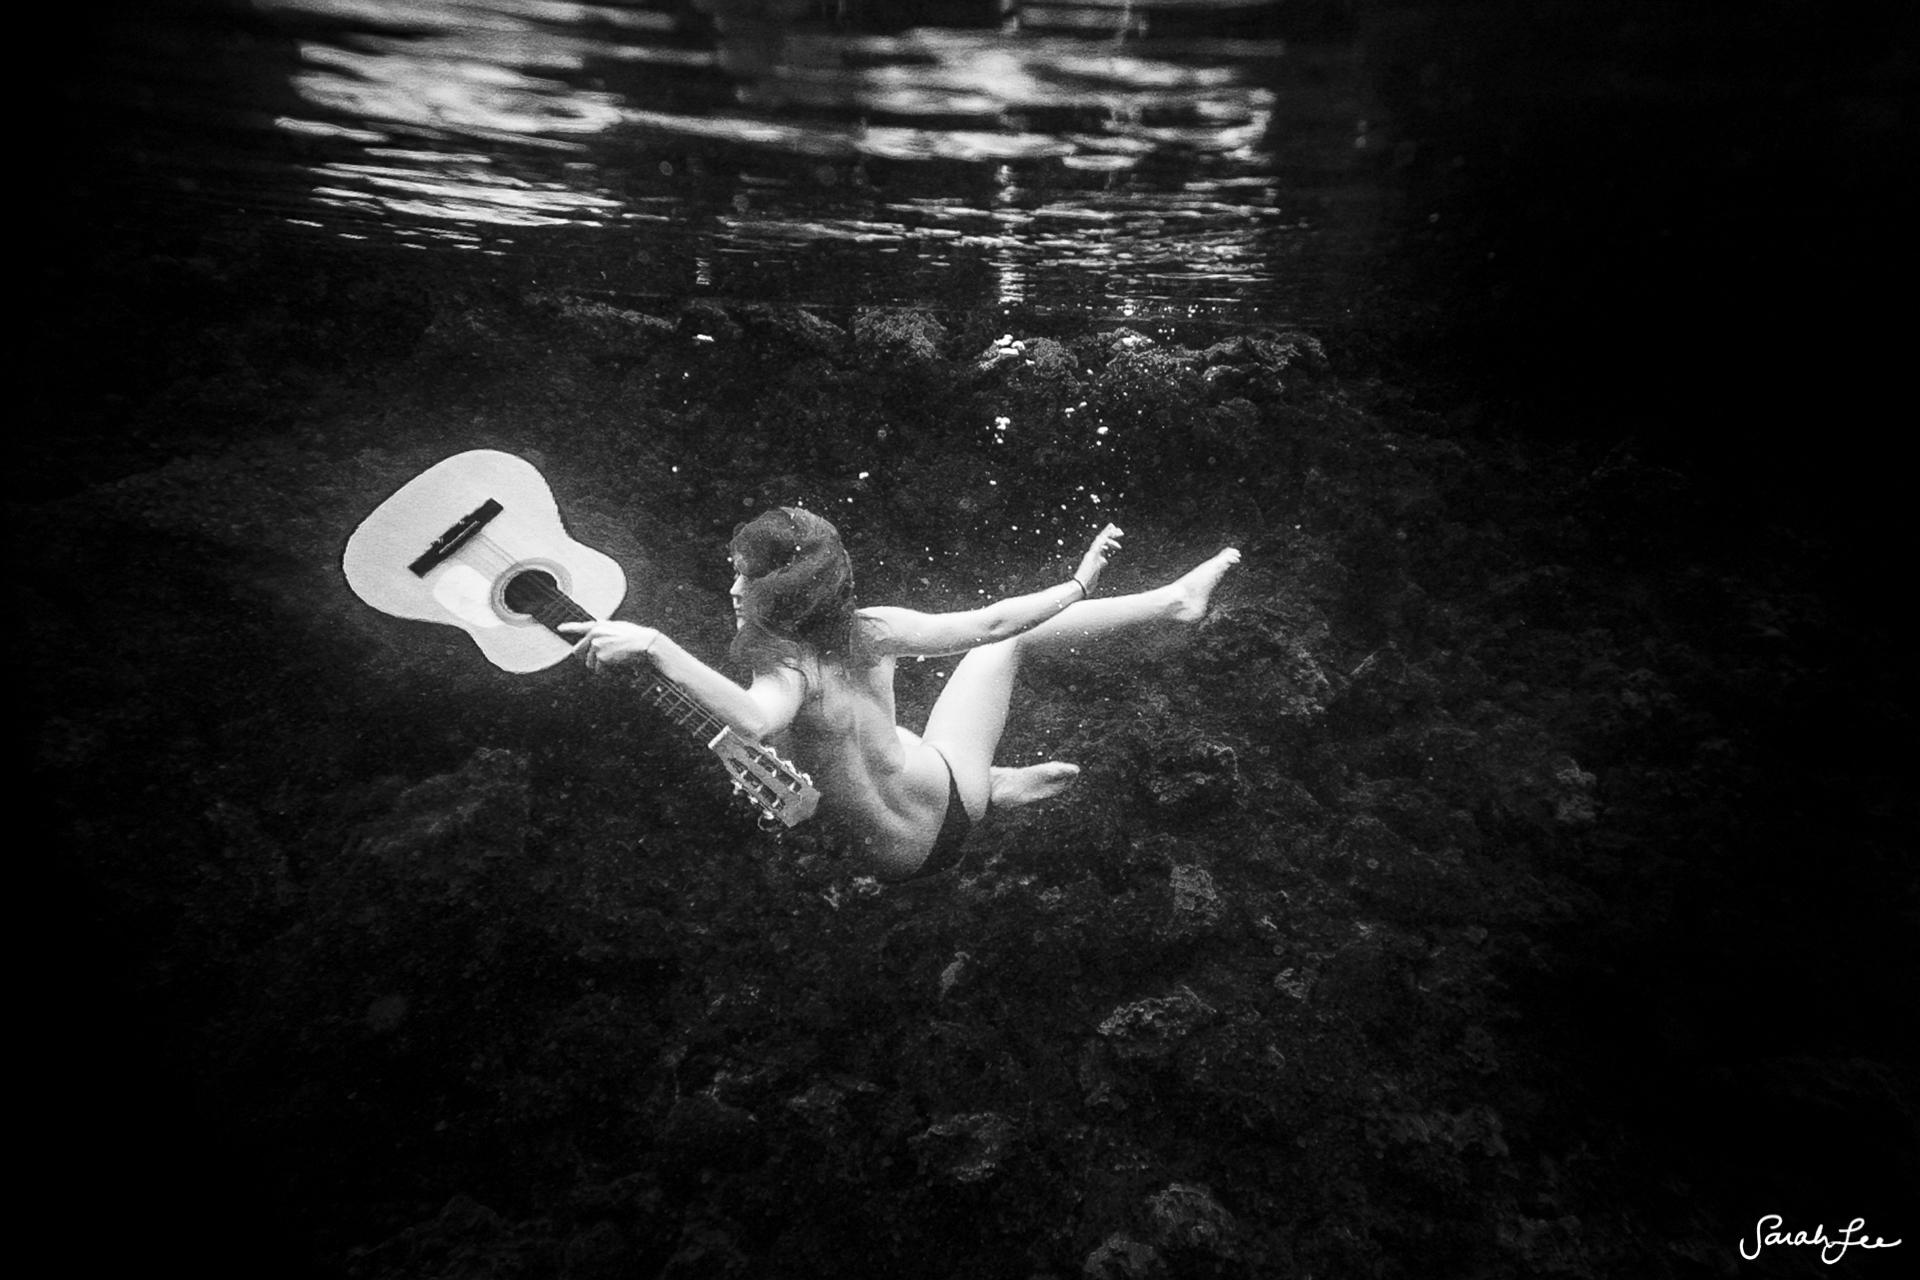 002_Sarah_Lee_Photography_Underwater_.jpg